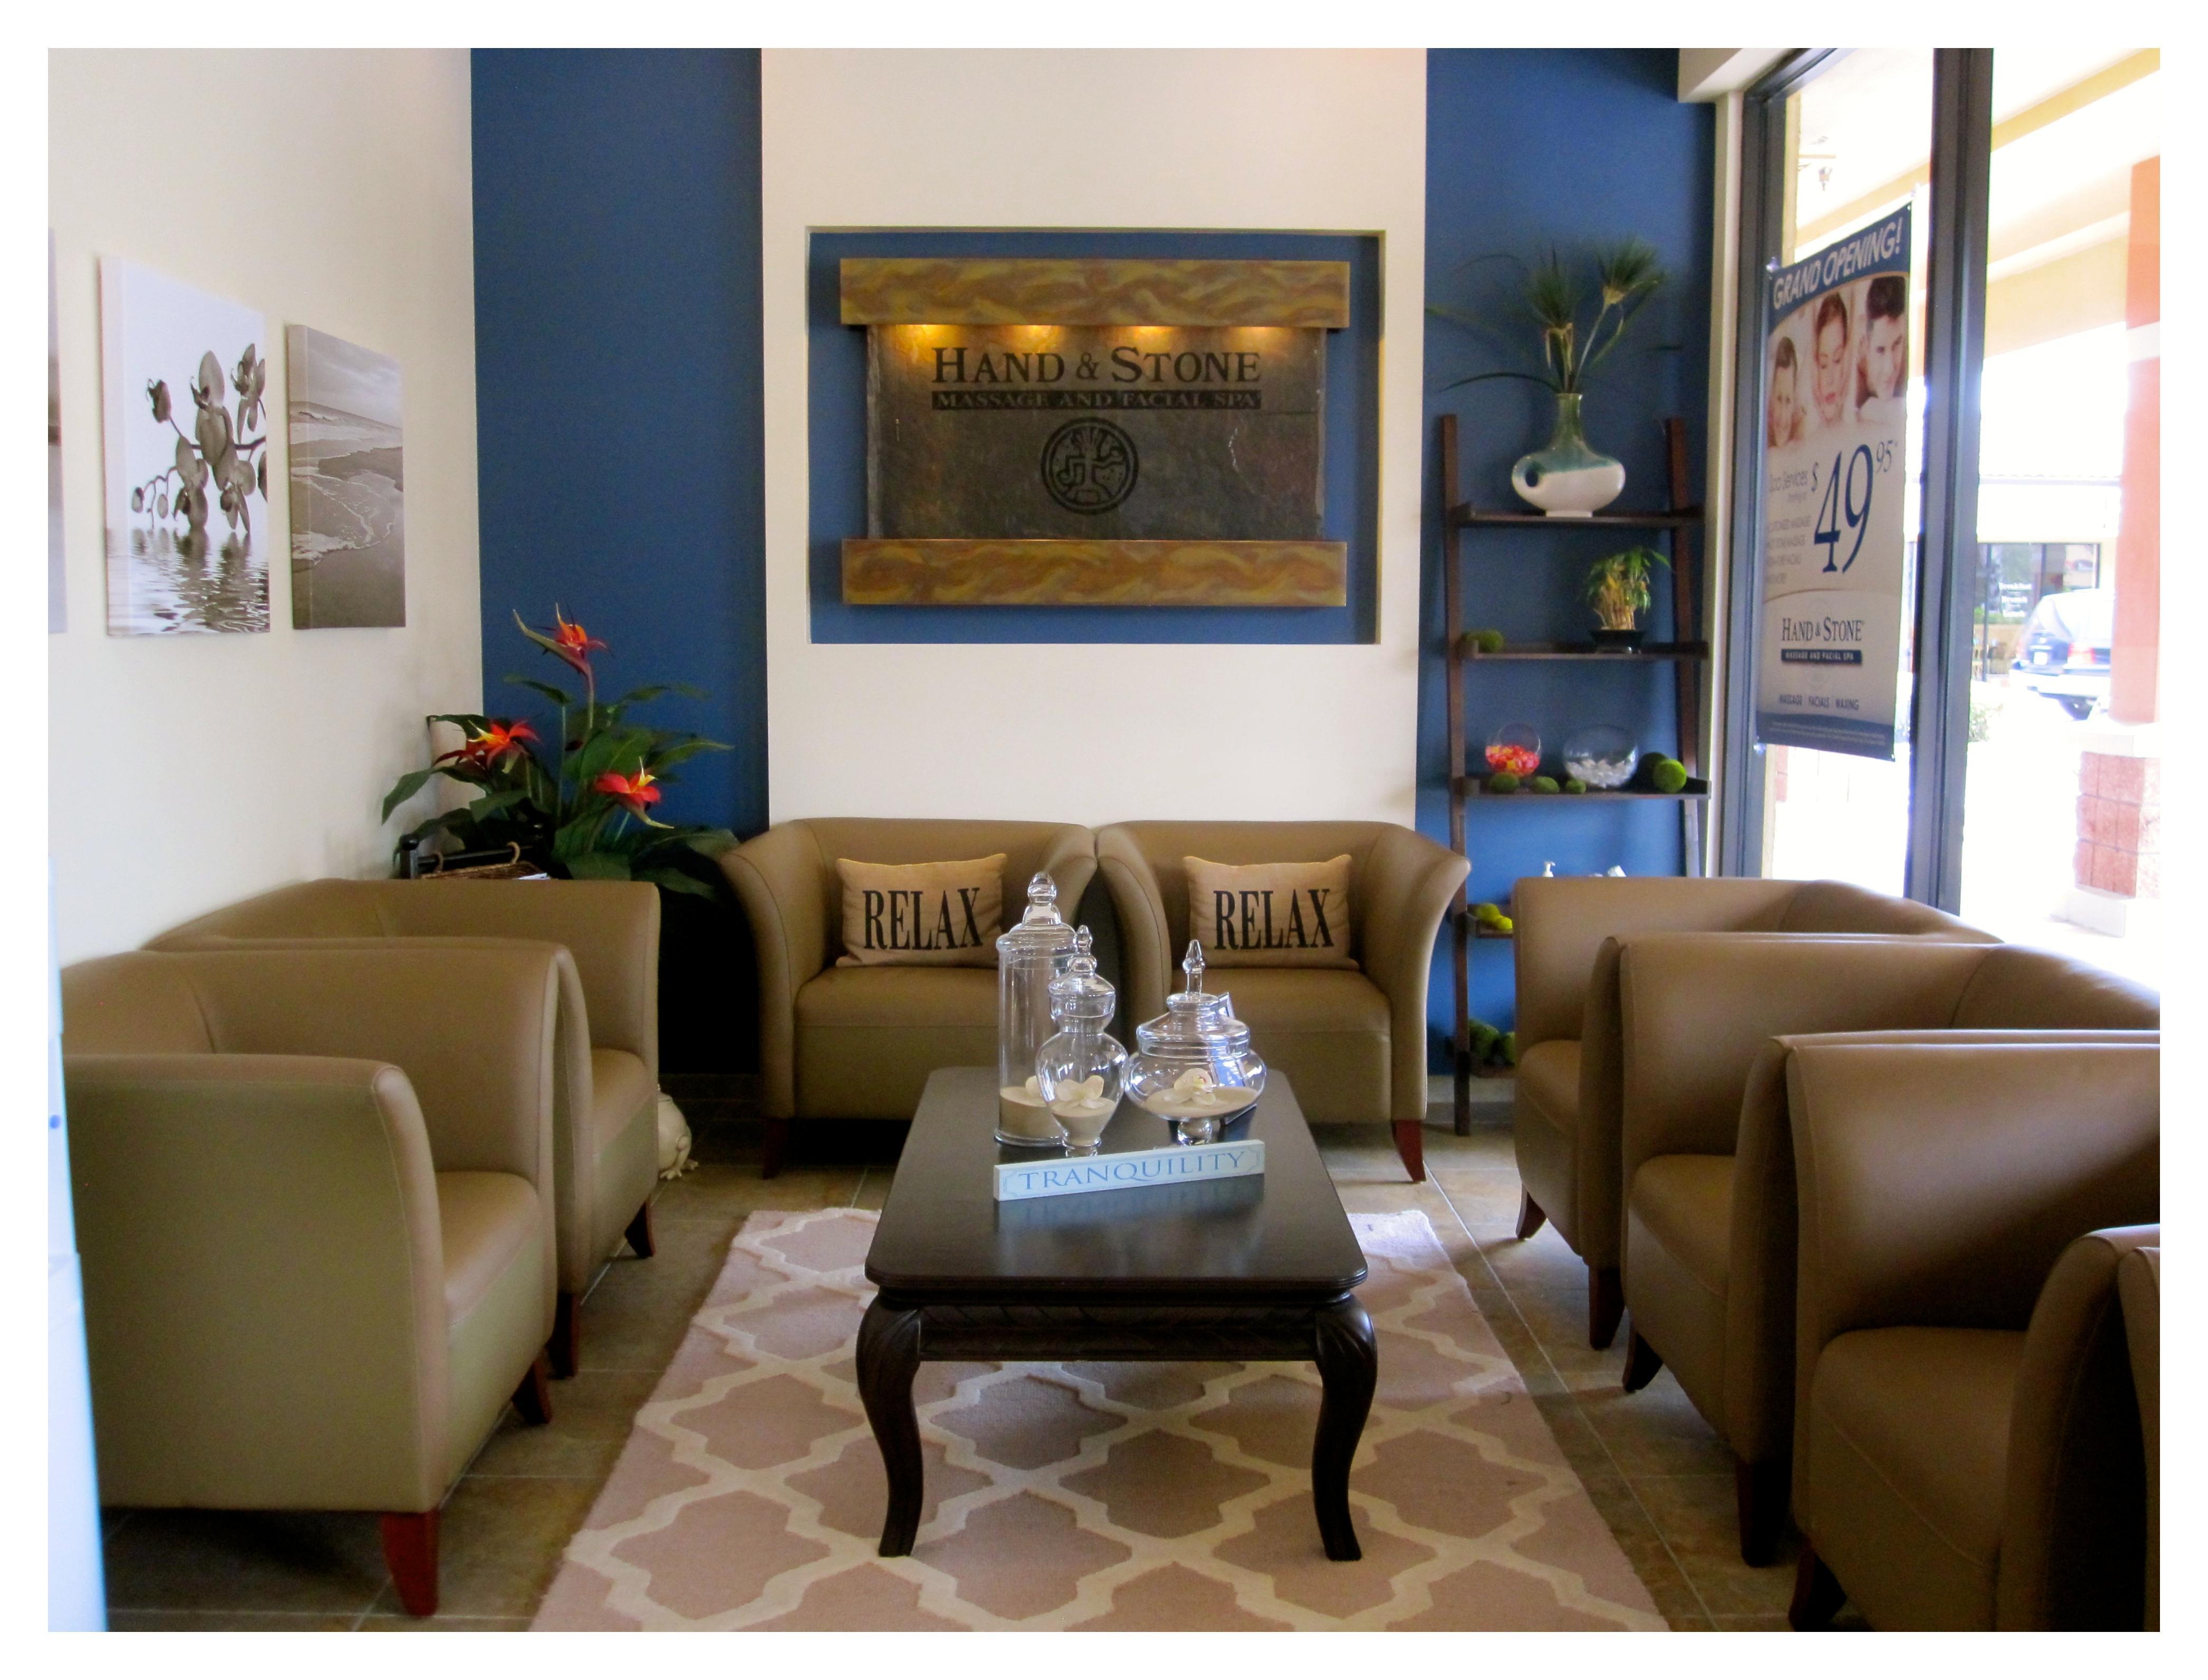 Hand stone massage and facial spa in jupiter fl 33458 for A suite salon jupiter